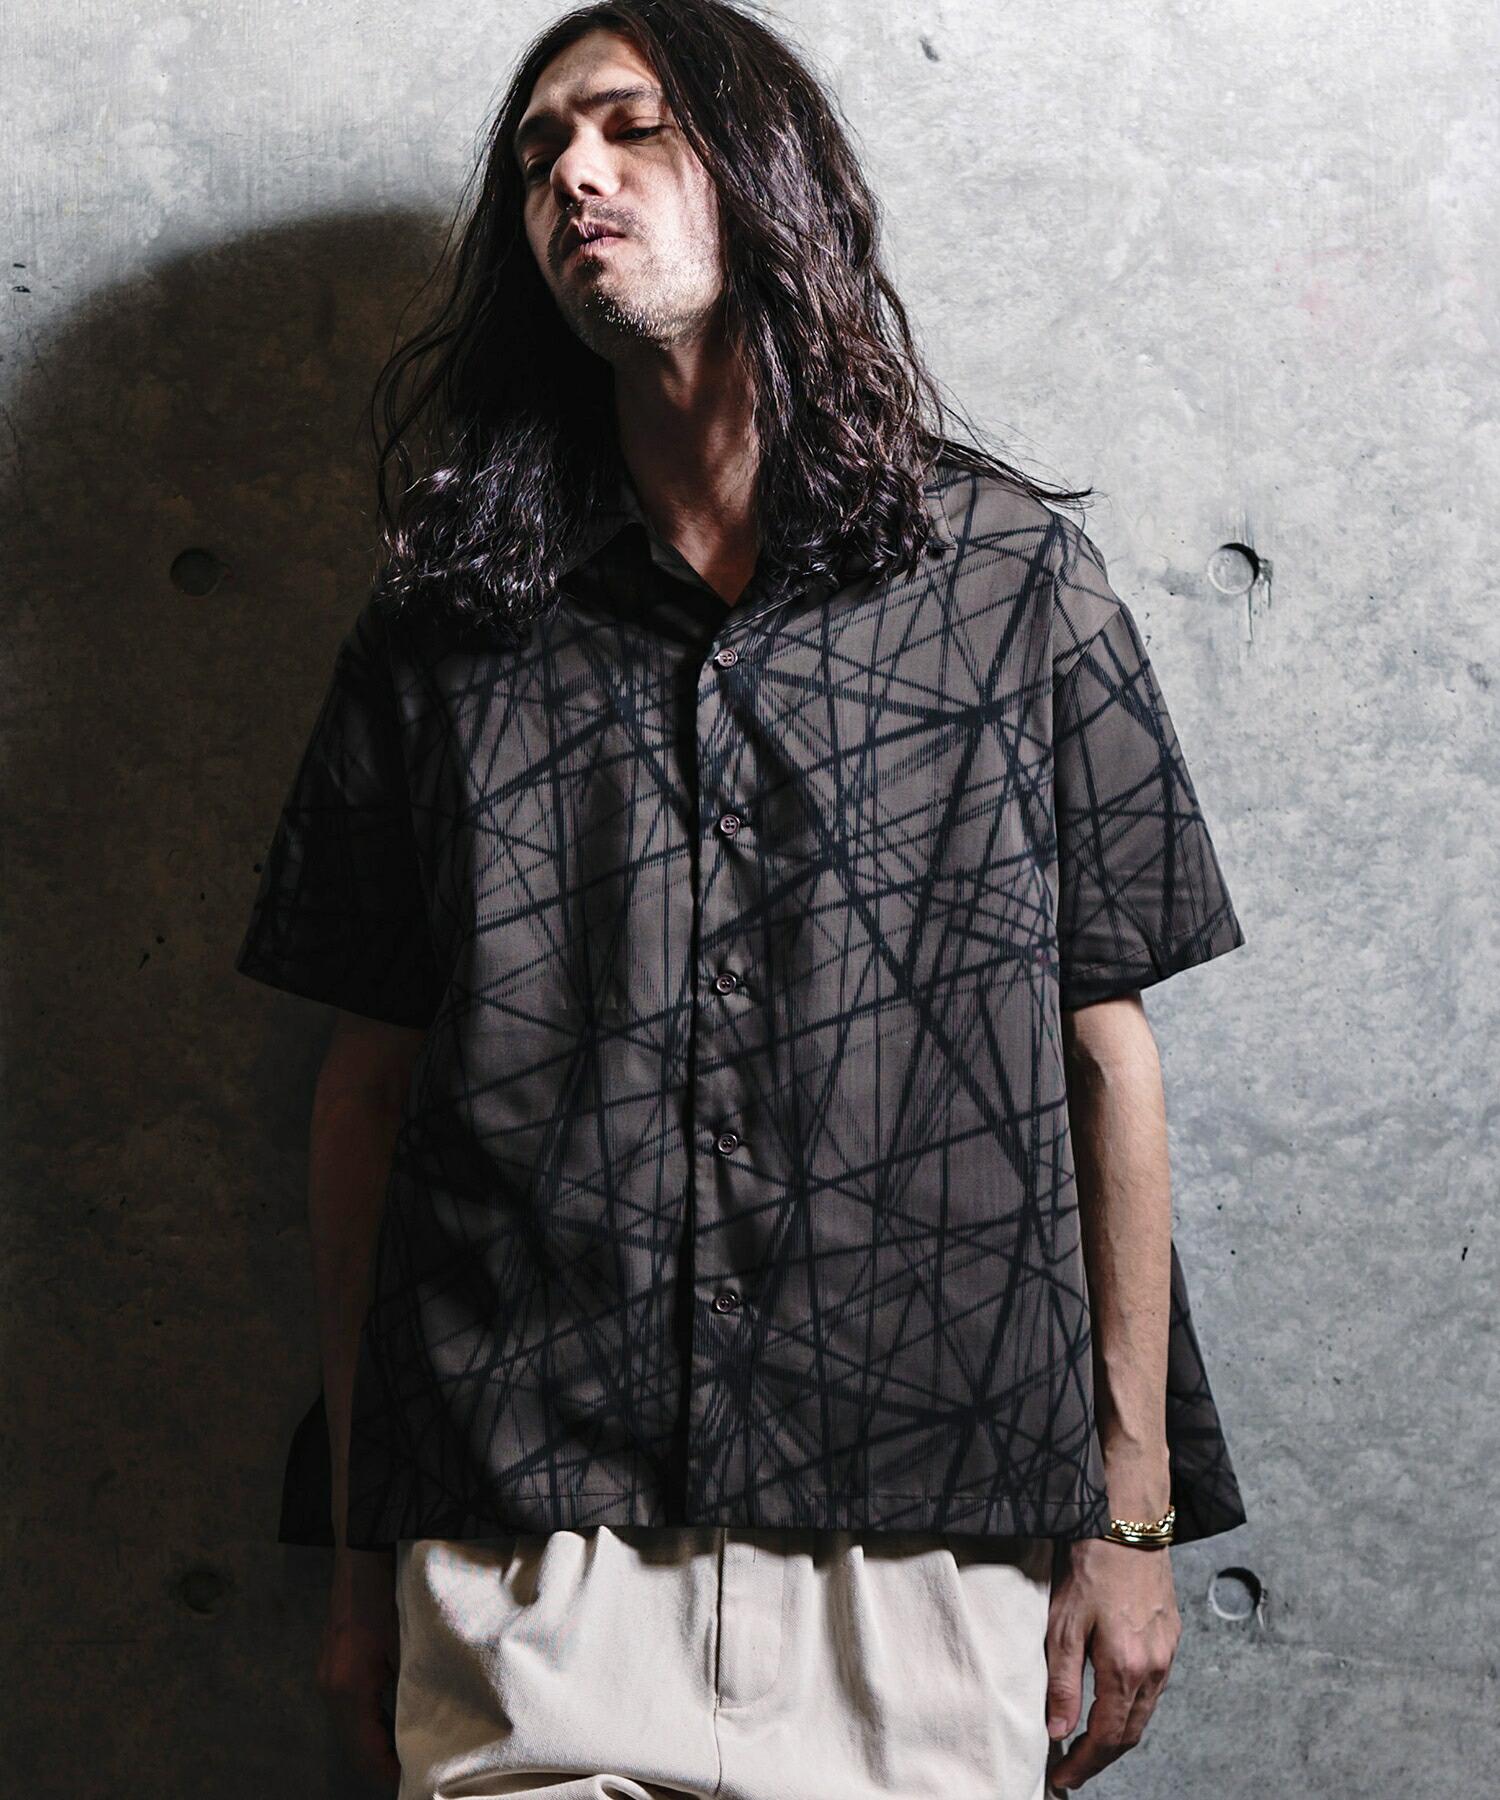 【GLIMCLAP(グリムクラップ)】 Geometry monotone pattern short-sleeve shirt シャツ(10-42-gls-cb)